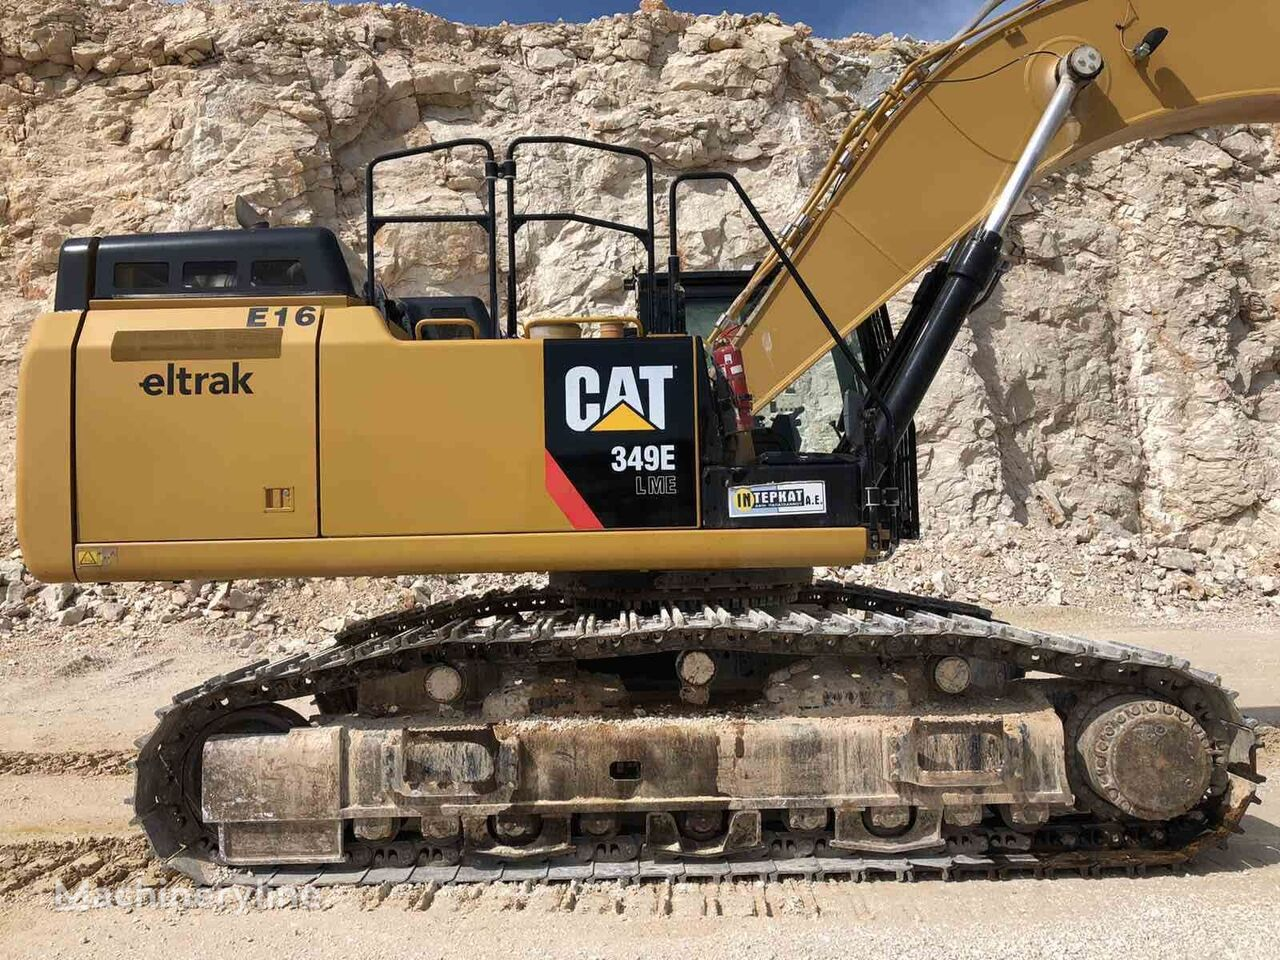 CATERPILLAR 349ELVG tracked excavator